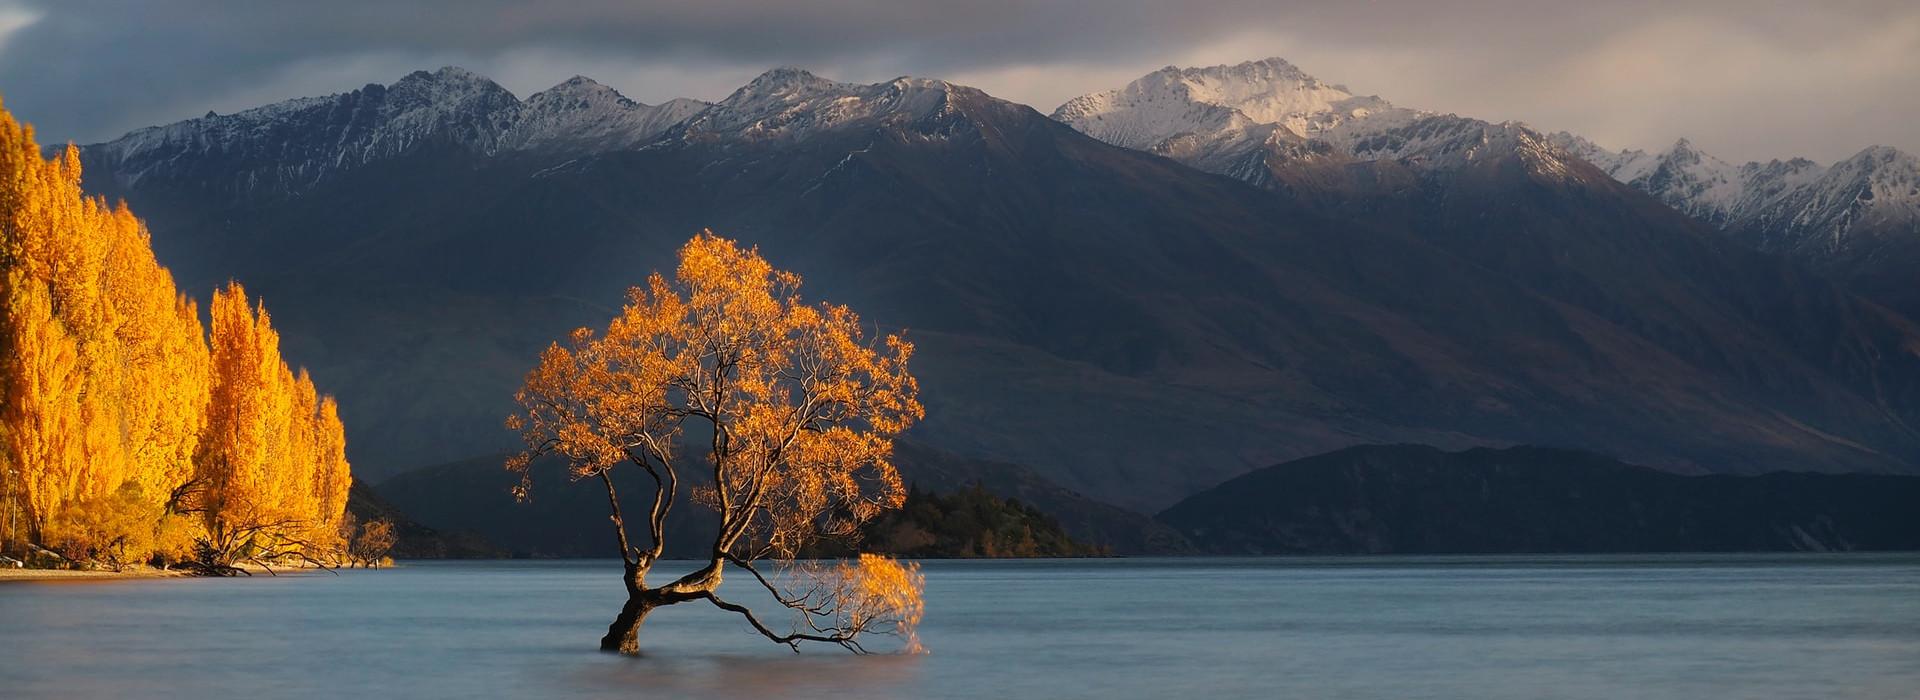 Lone Tree of Lake Wanaka @kunosch